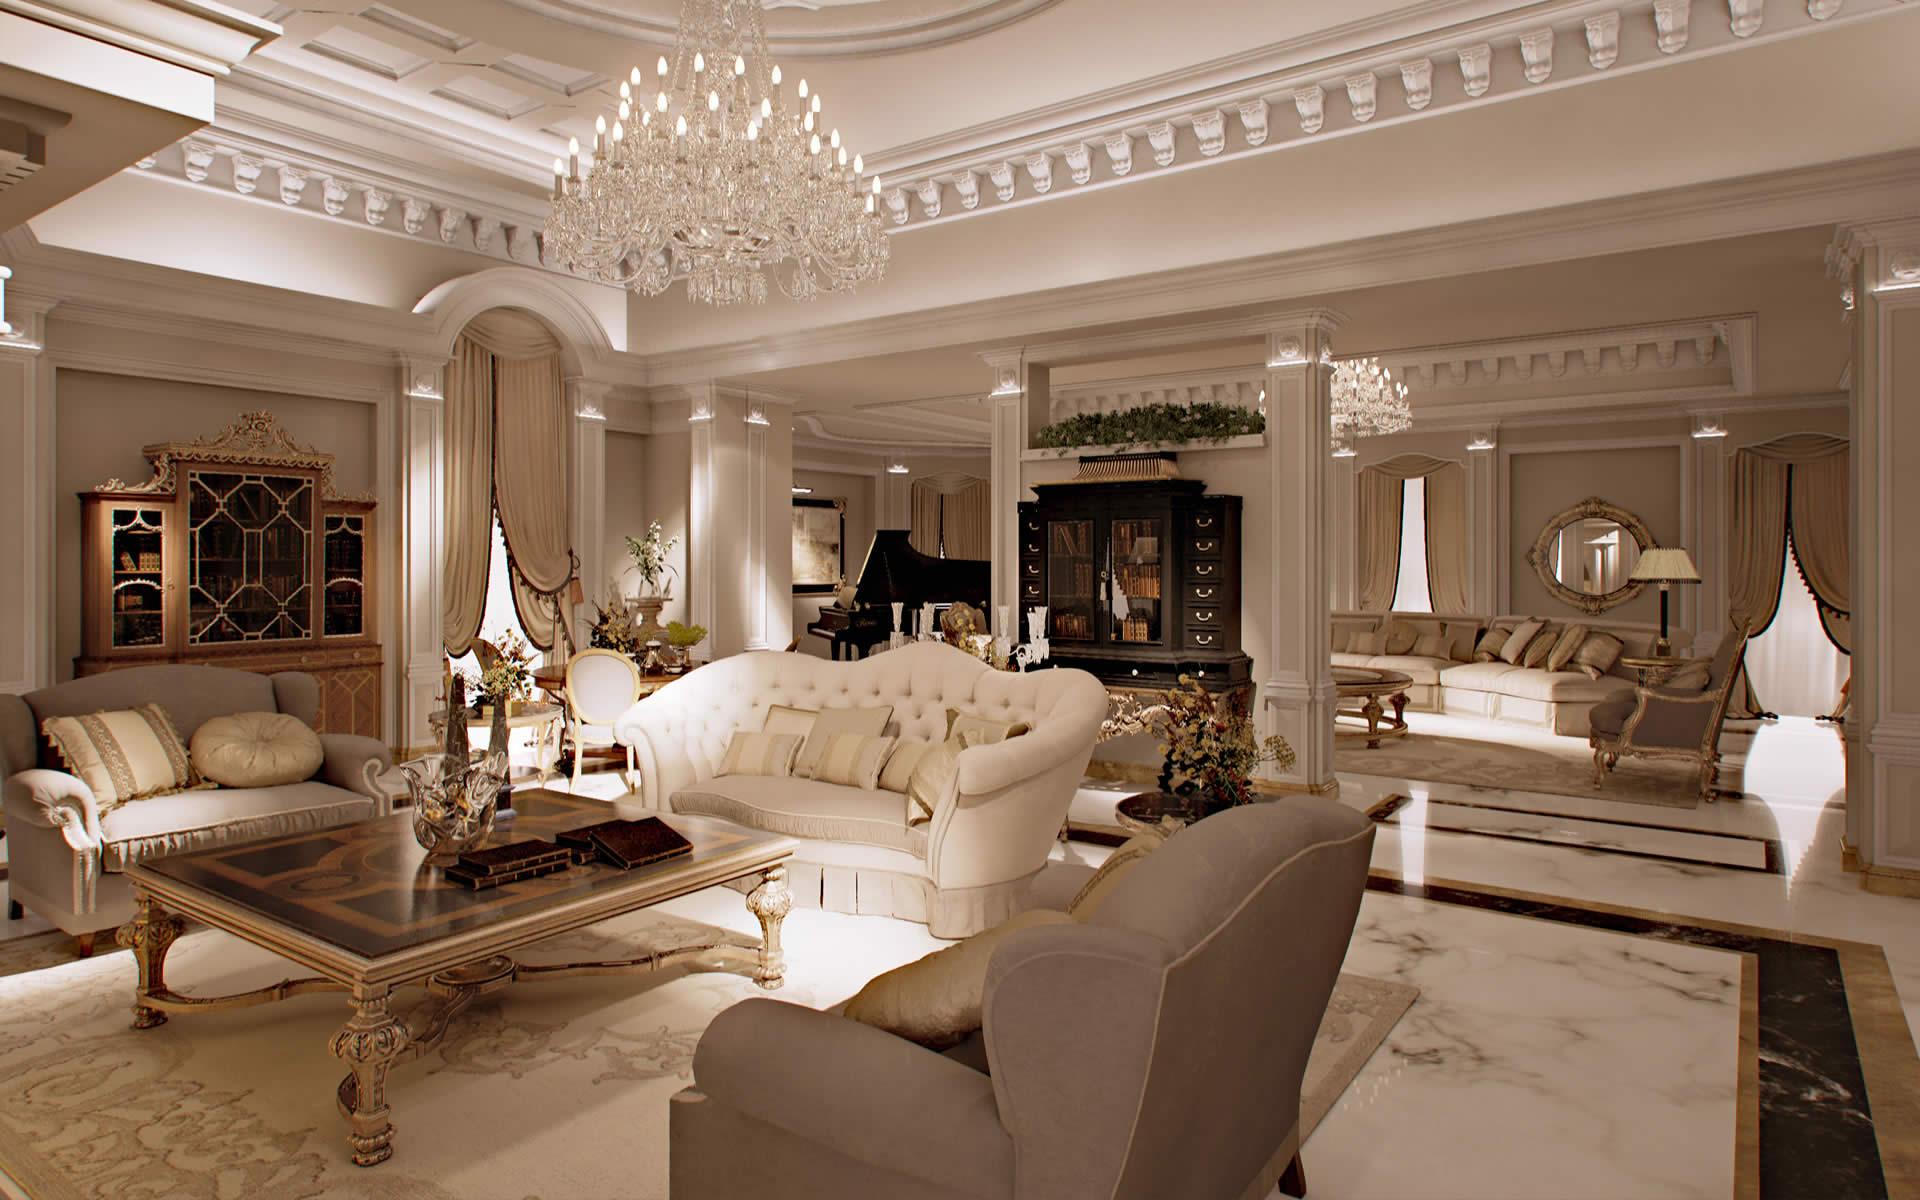 Arredamenti Per Case Moderne.Arredo Casa Genova Elegant Arredamenti Credenza Cod Noce